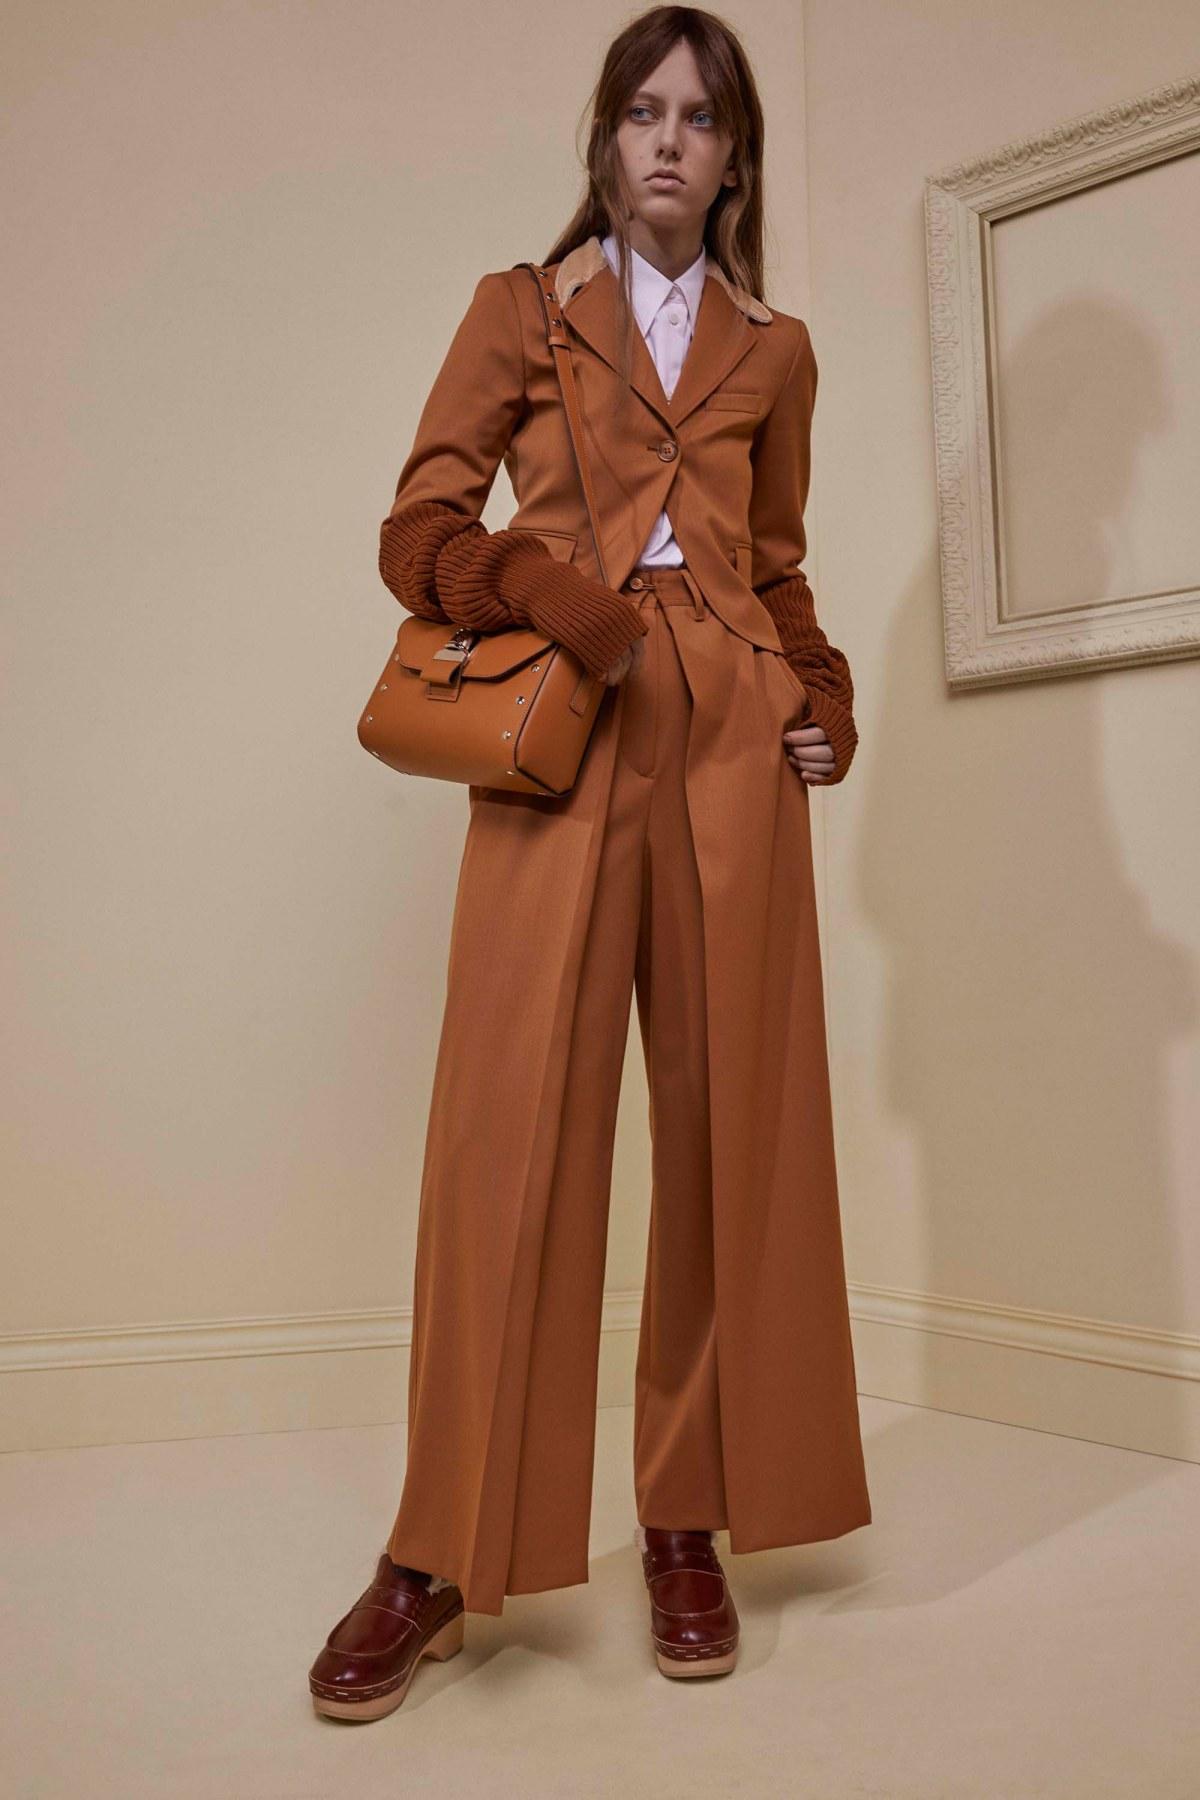 mm6-maison-margiela-pre-fall-2017-fashion-show-the-impression-15